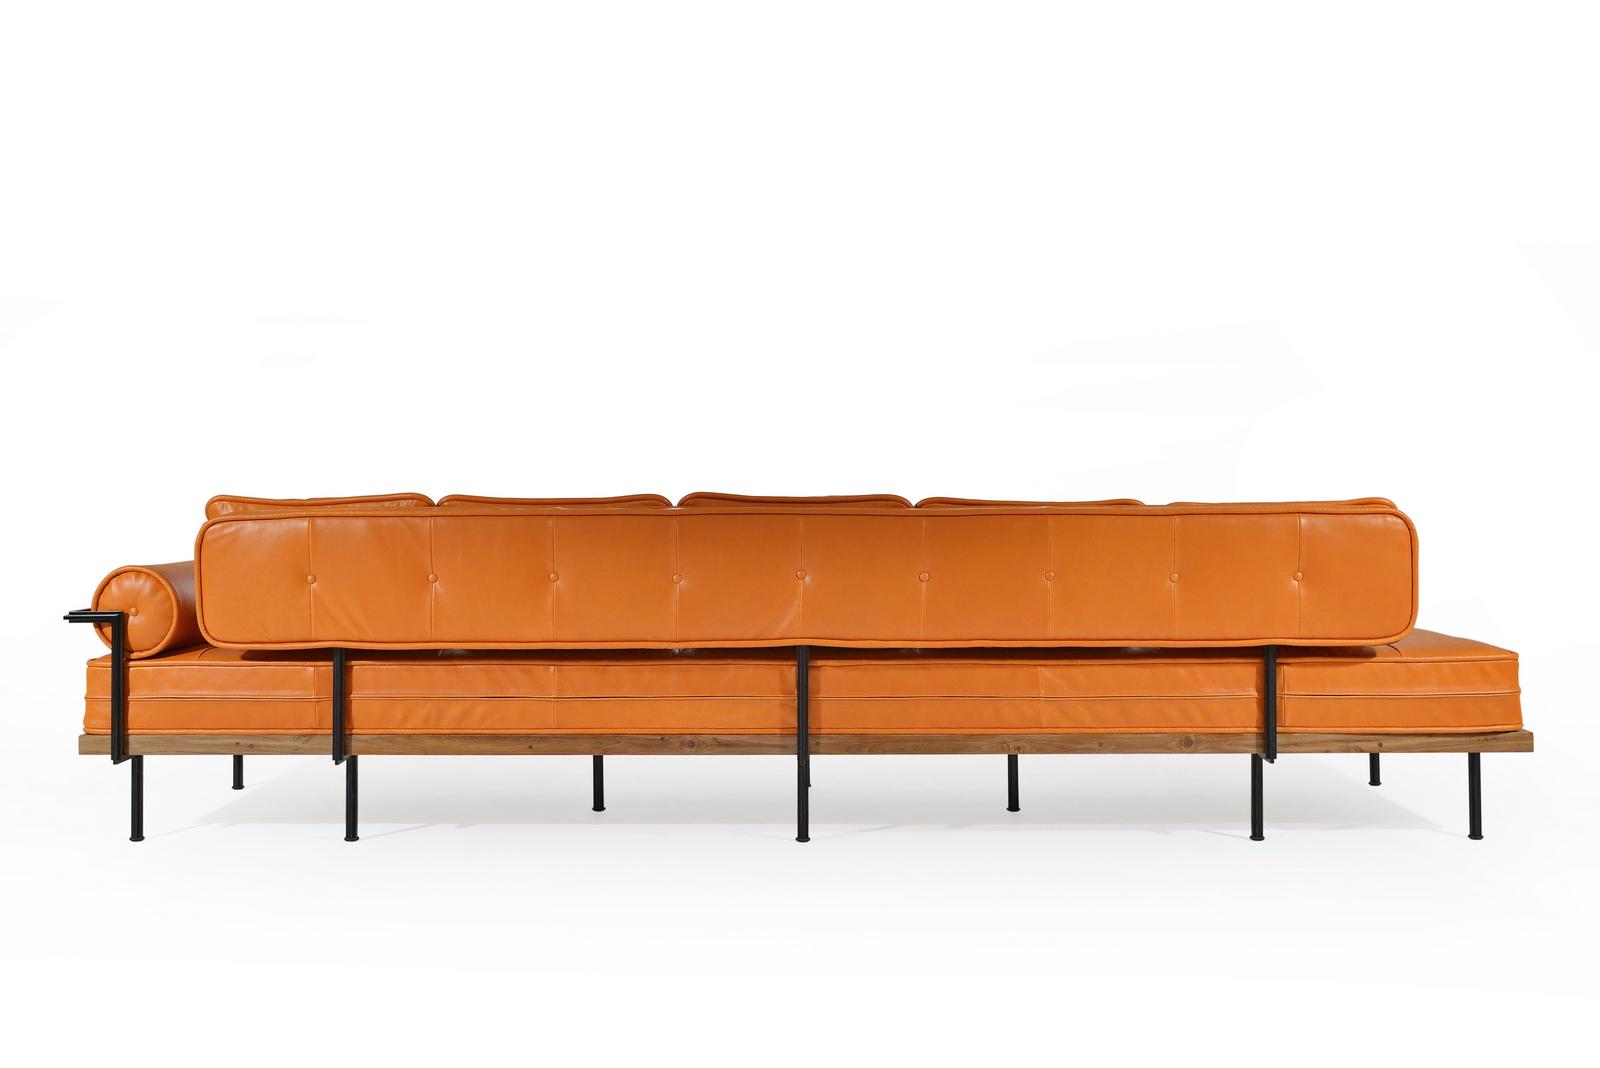 PTendercool-Sofa Corner-BS3-TE-BL-NO-Leather-210623-12